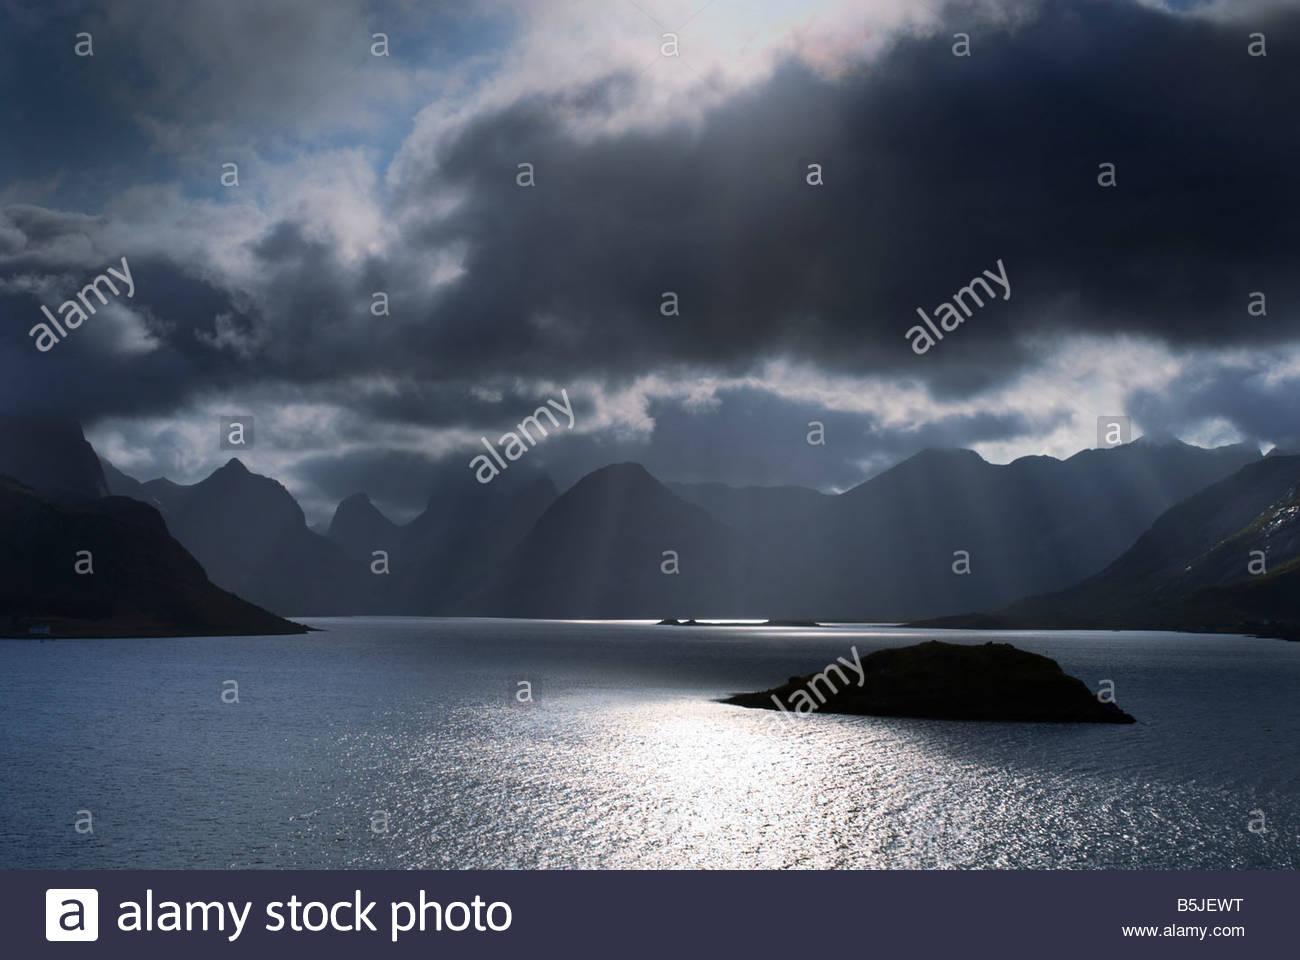 Ciel orageux, îles Lofoten, Norvège. Photo Stock